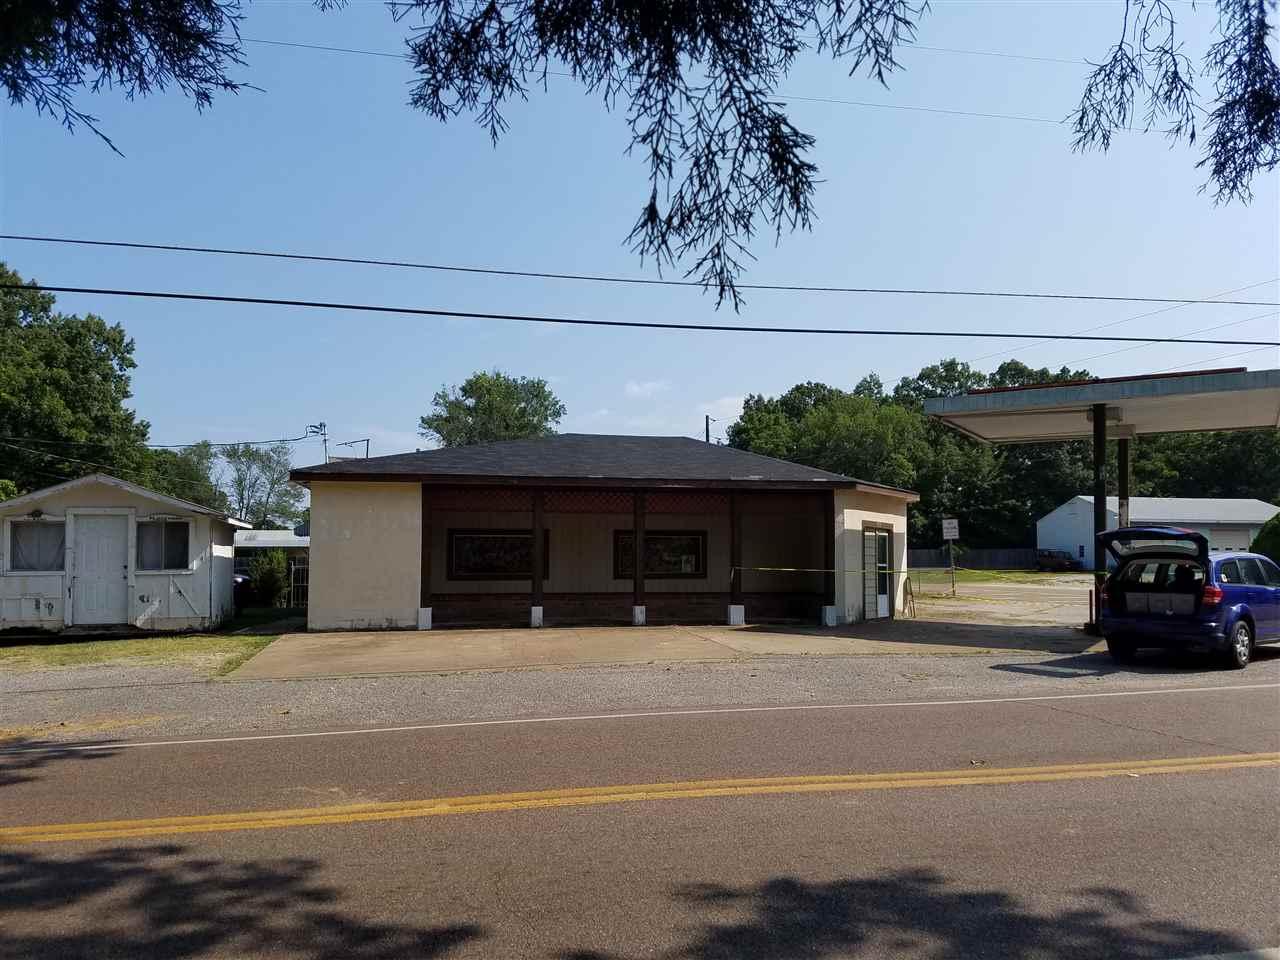 15707 Hwy 193 Williston, TN 38076 - MLS #: 10008837